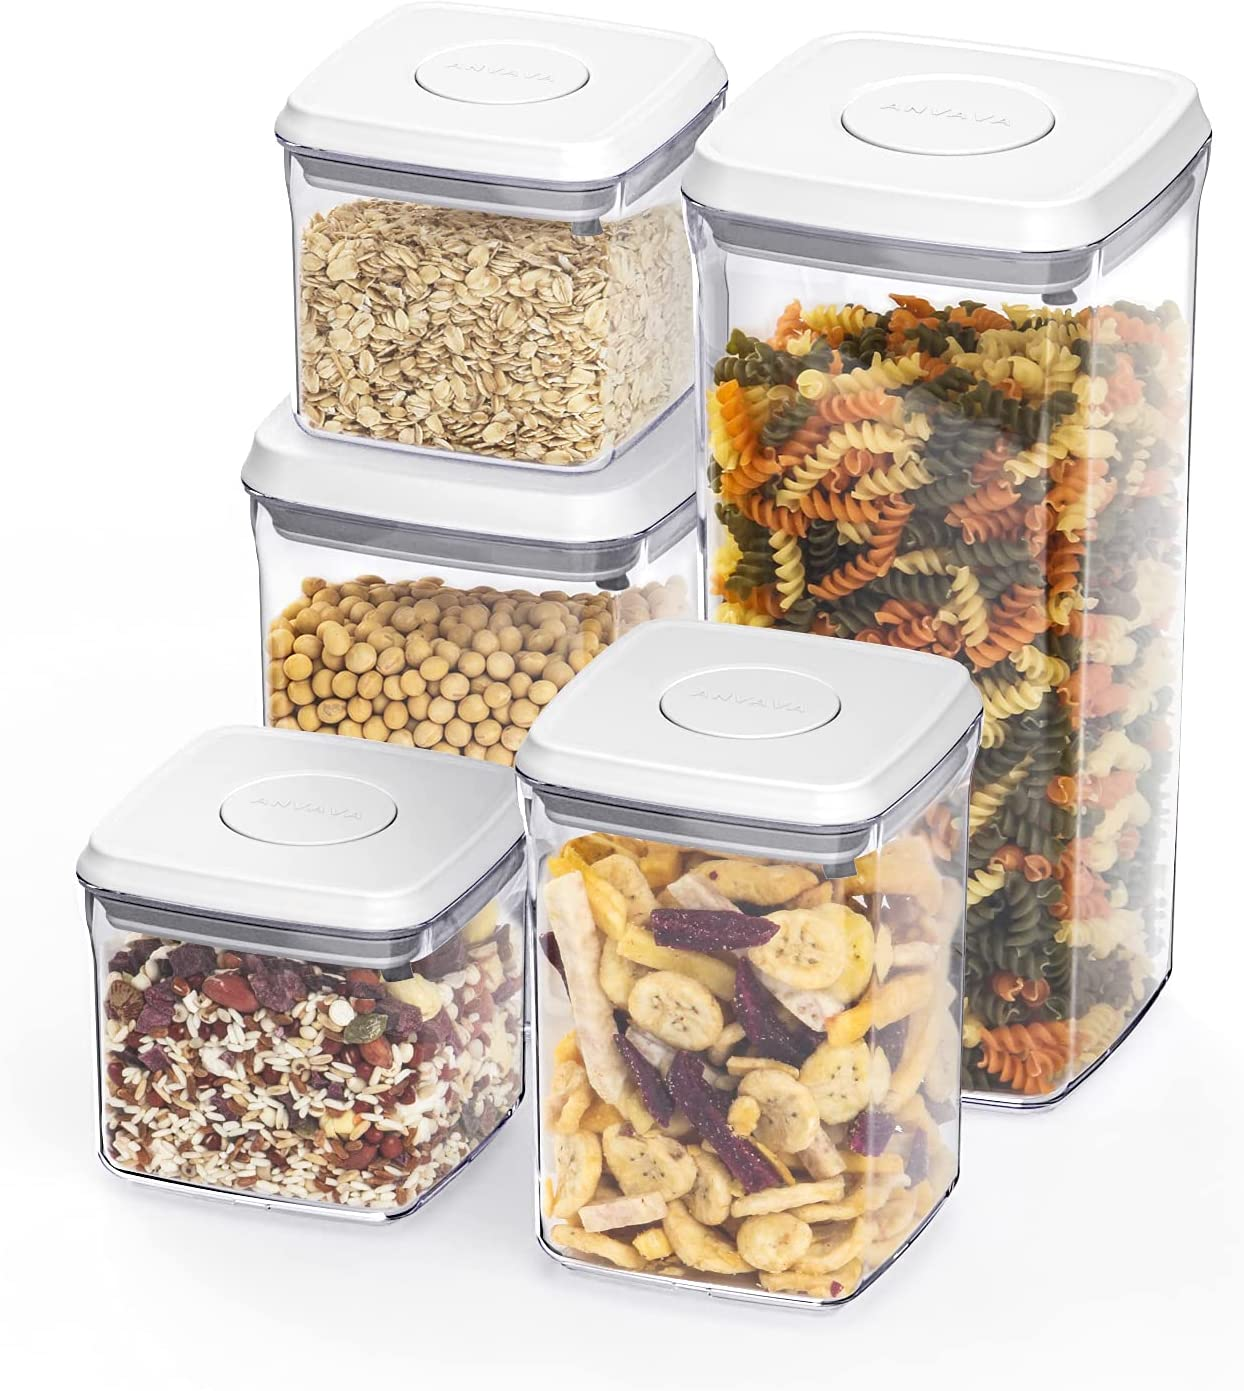 Airtight Food Storage Containers Set - Kitchen P Mesa Tucson Mall Mall ANVAVA 5-Pieces